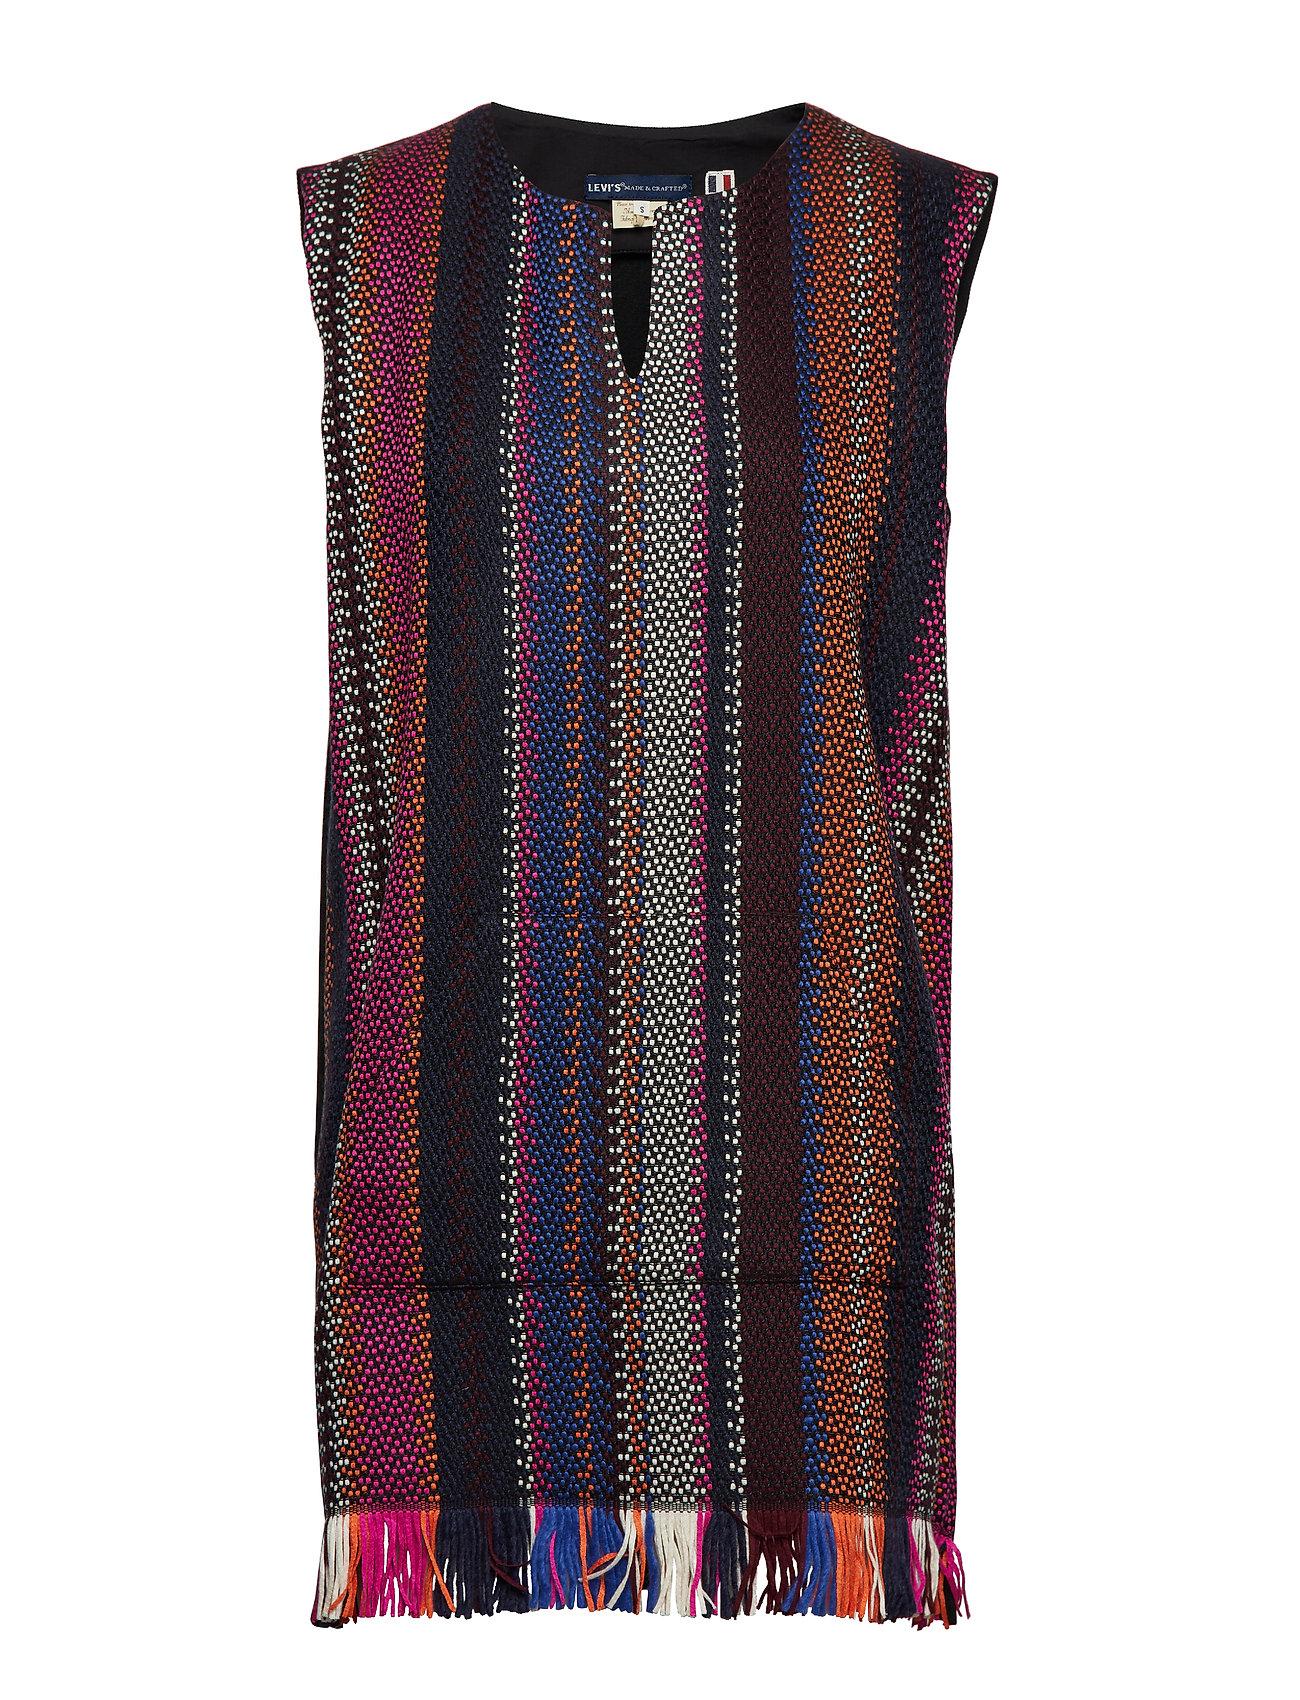 LEVI'S Lmc Blanket Dress Lmc Summer B